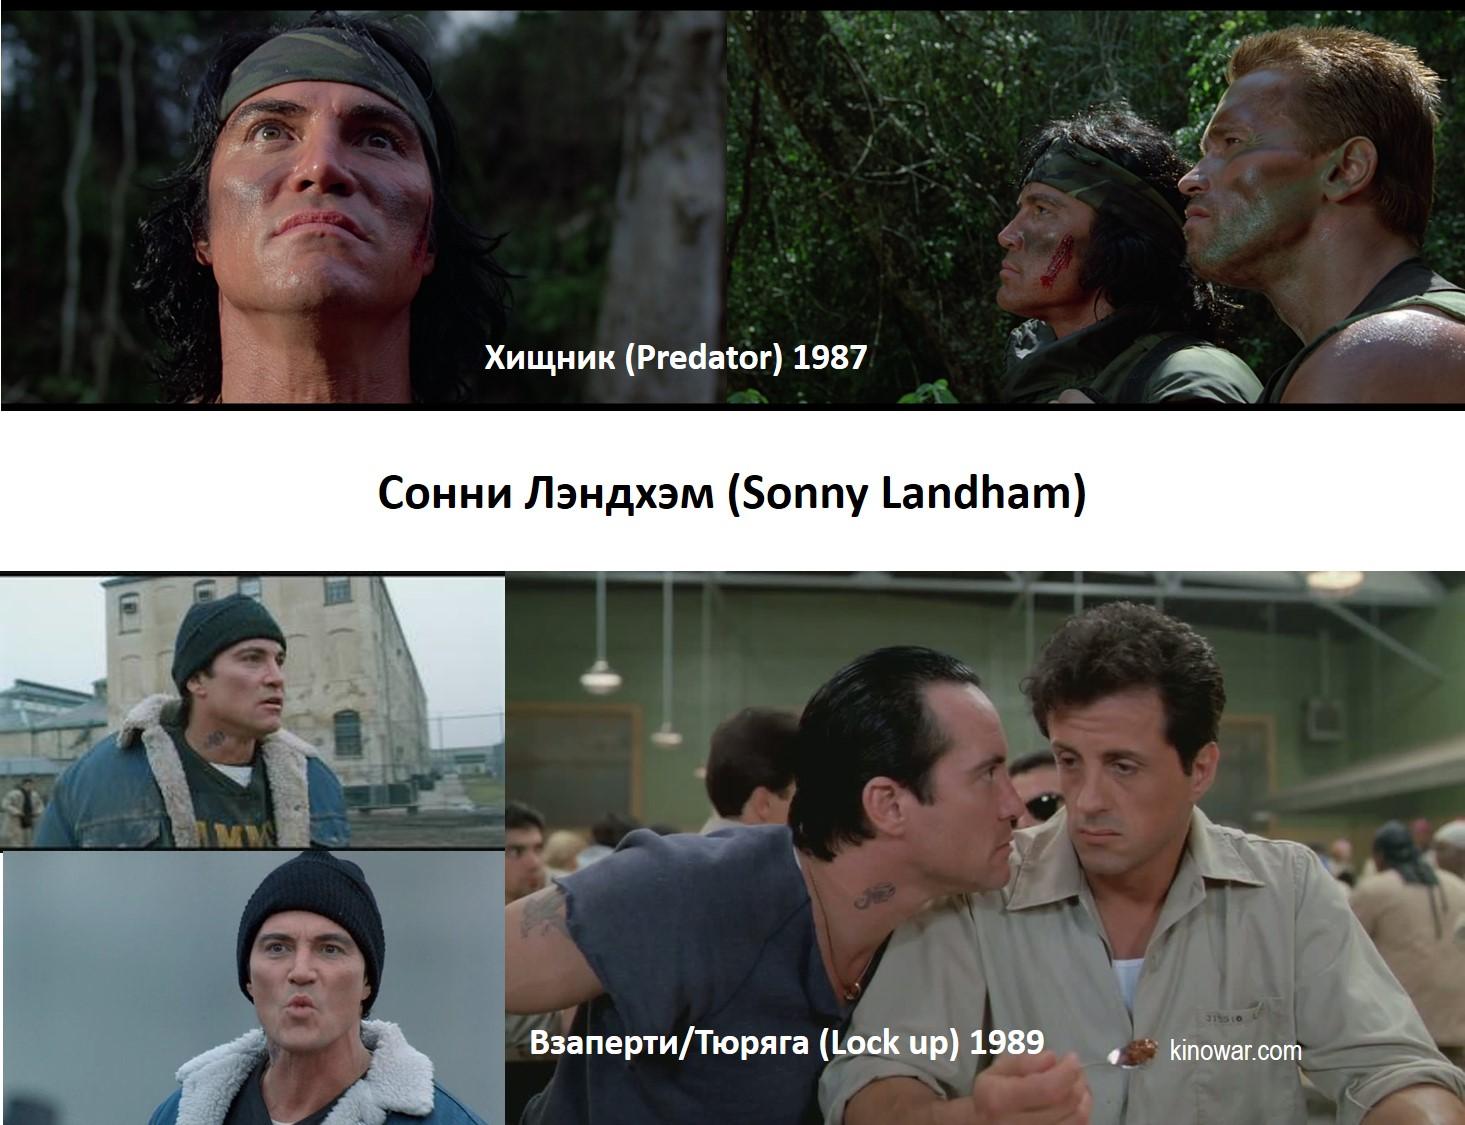 А вы знали? Сонни Лэндхэм Sonny Landham